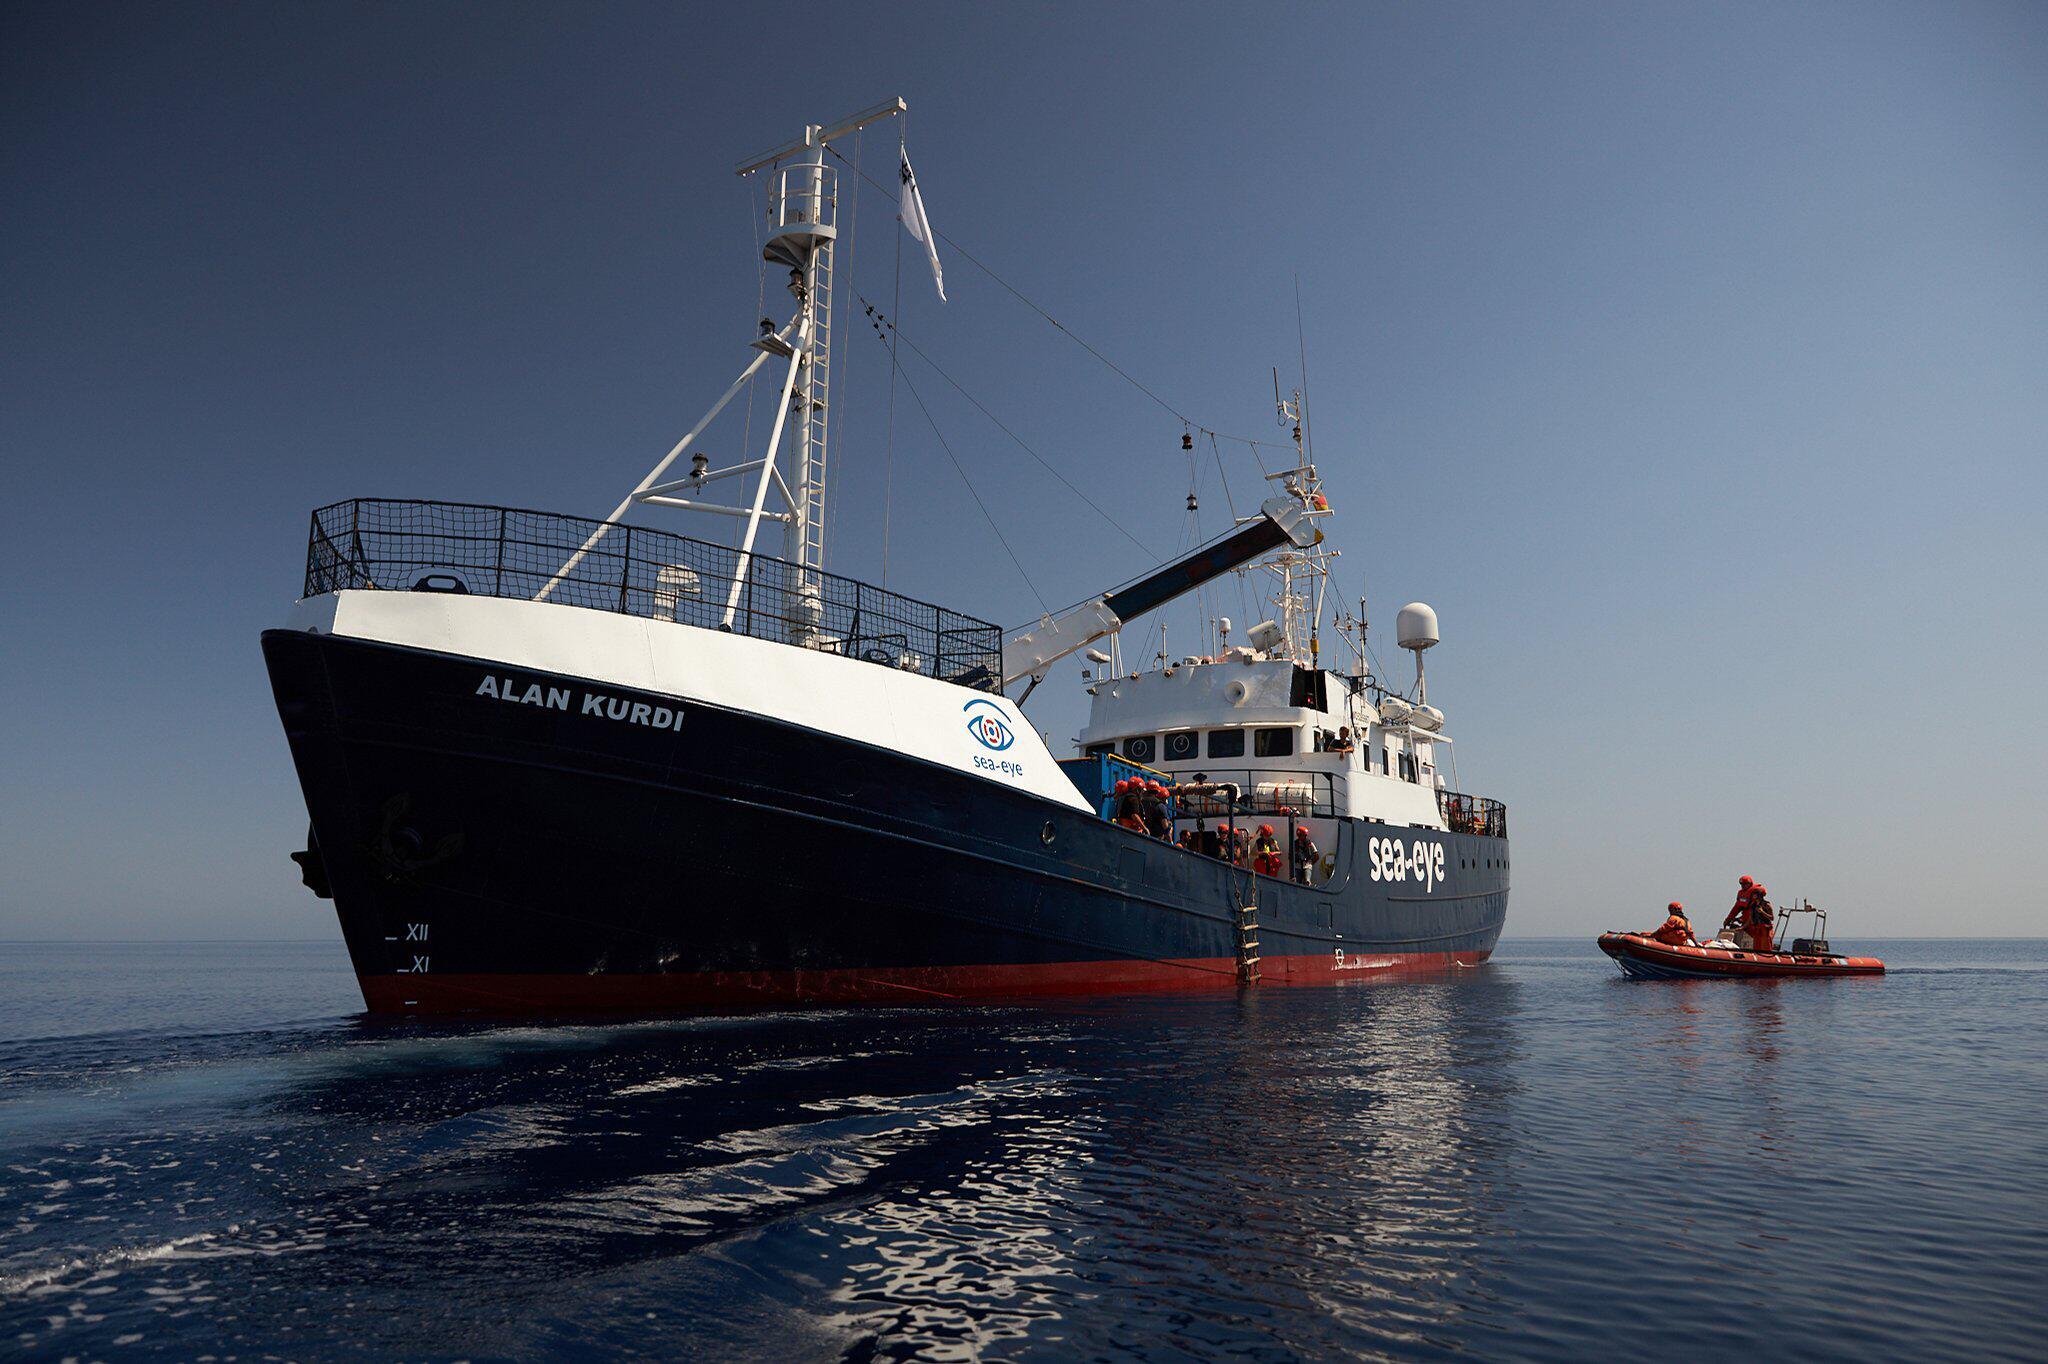 Bild zu Seenotrettung im Mittelmeer - «Alan Kurdi»